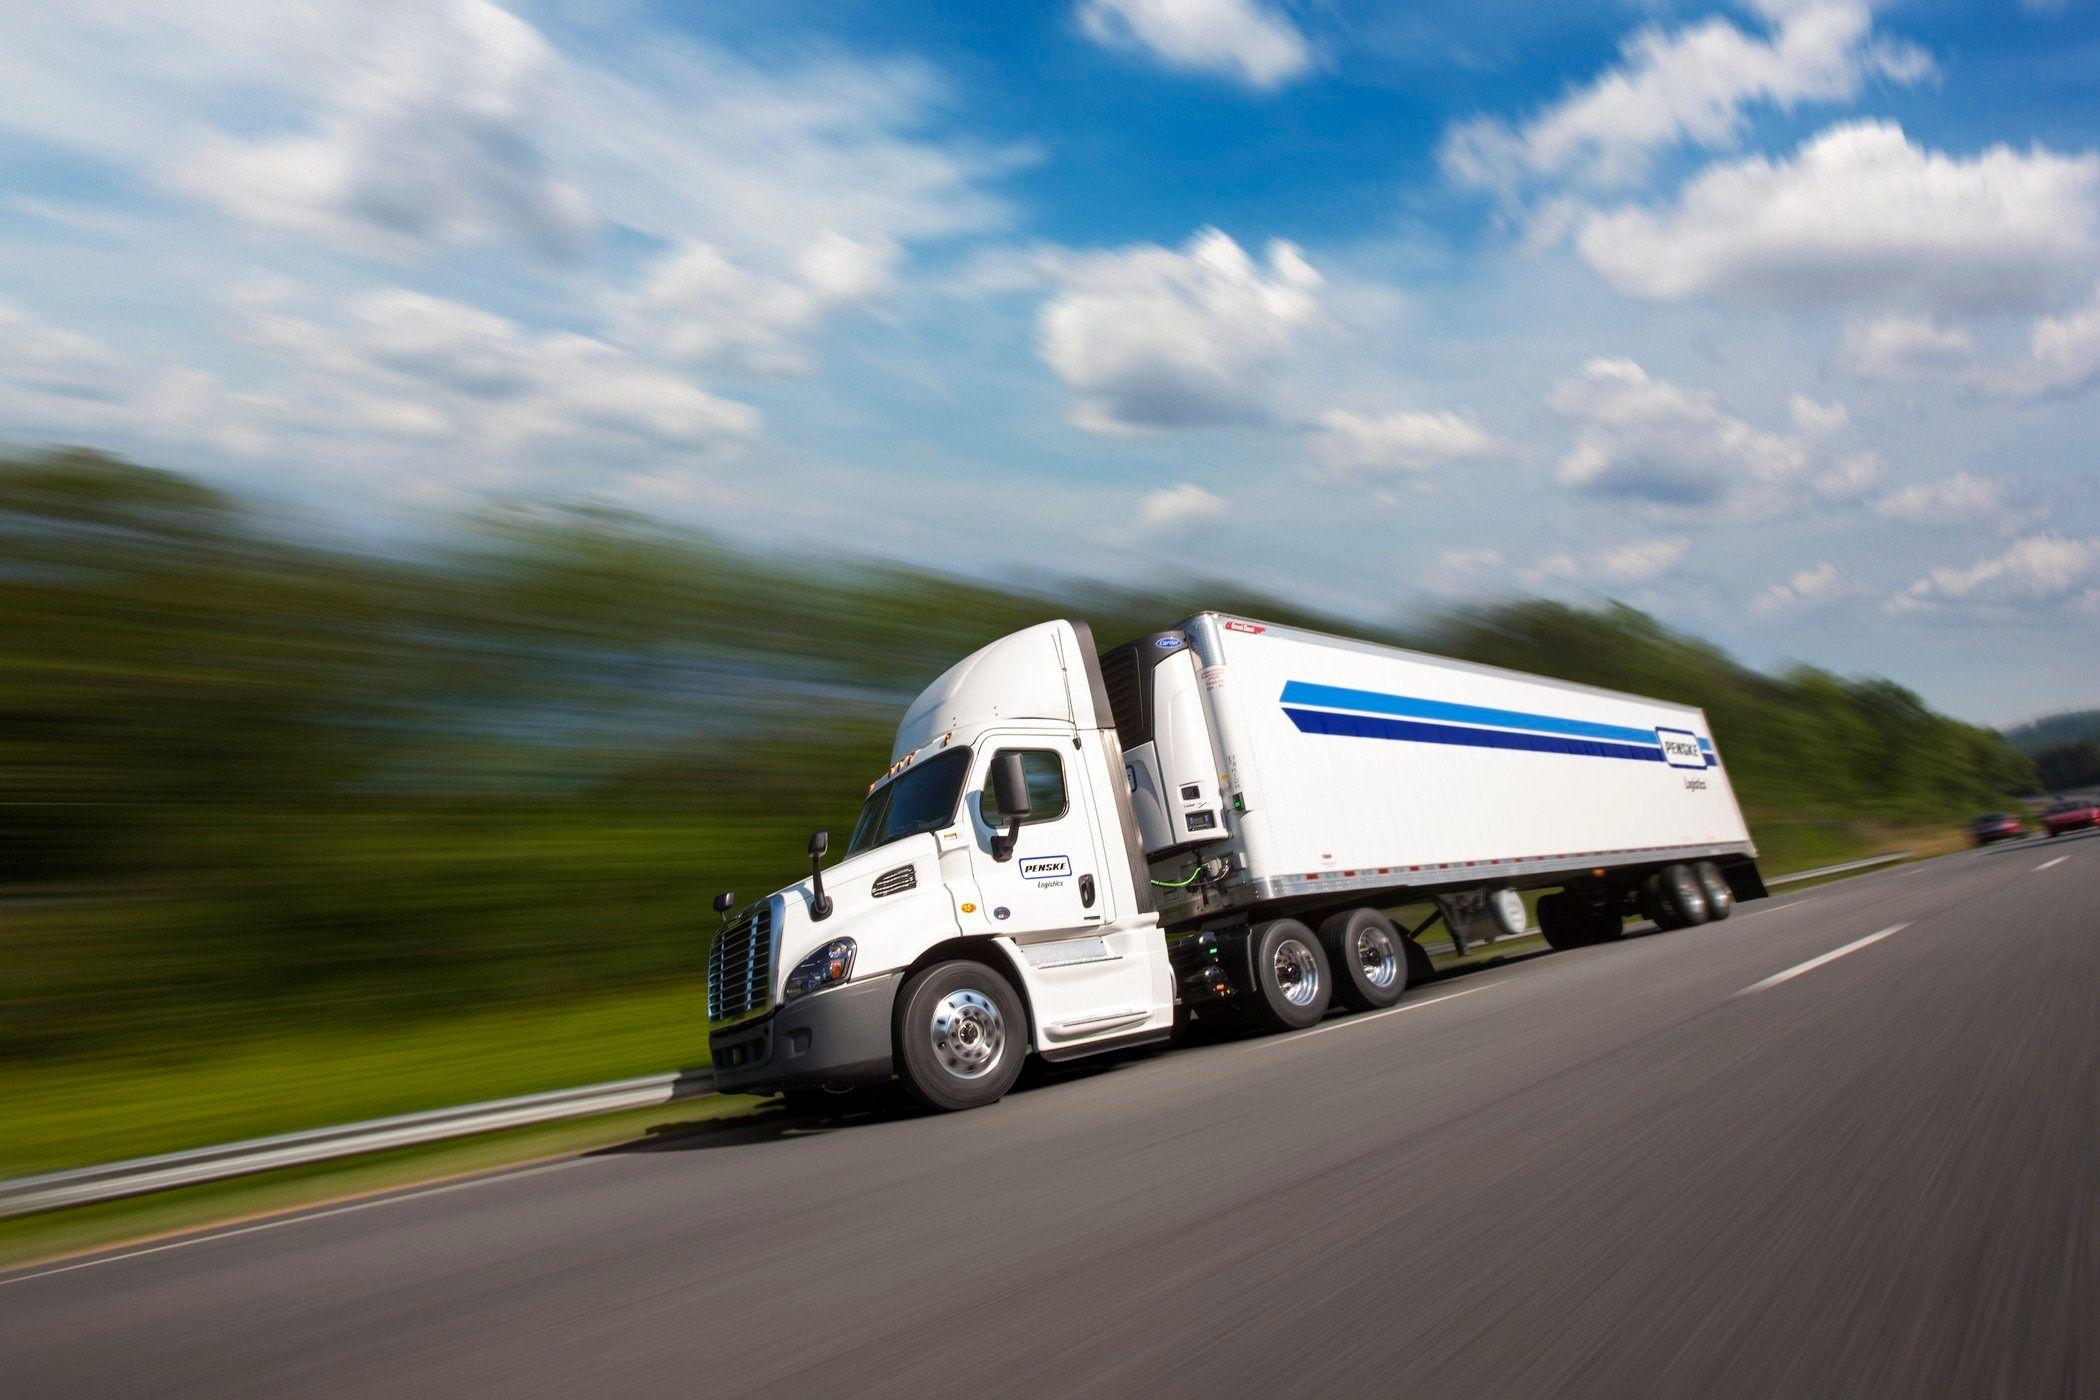 Penske Logistics truck on the road